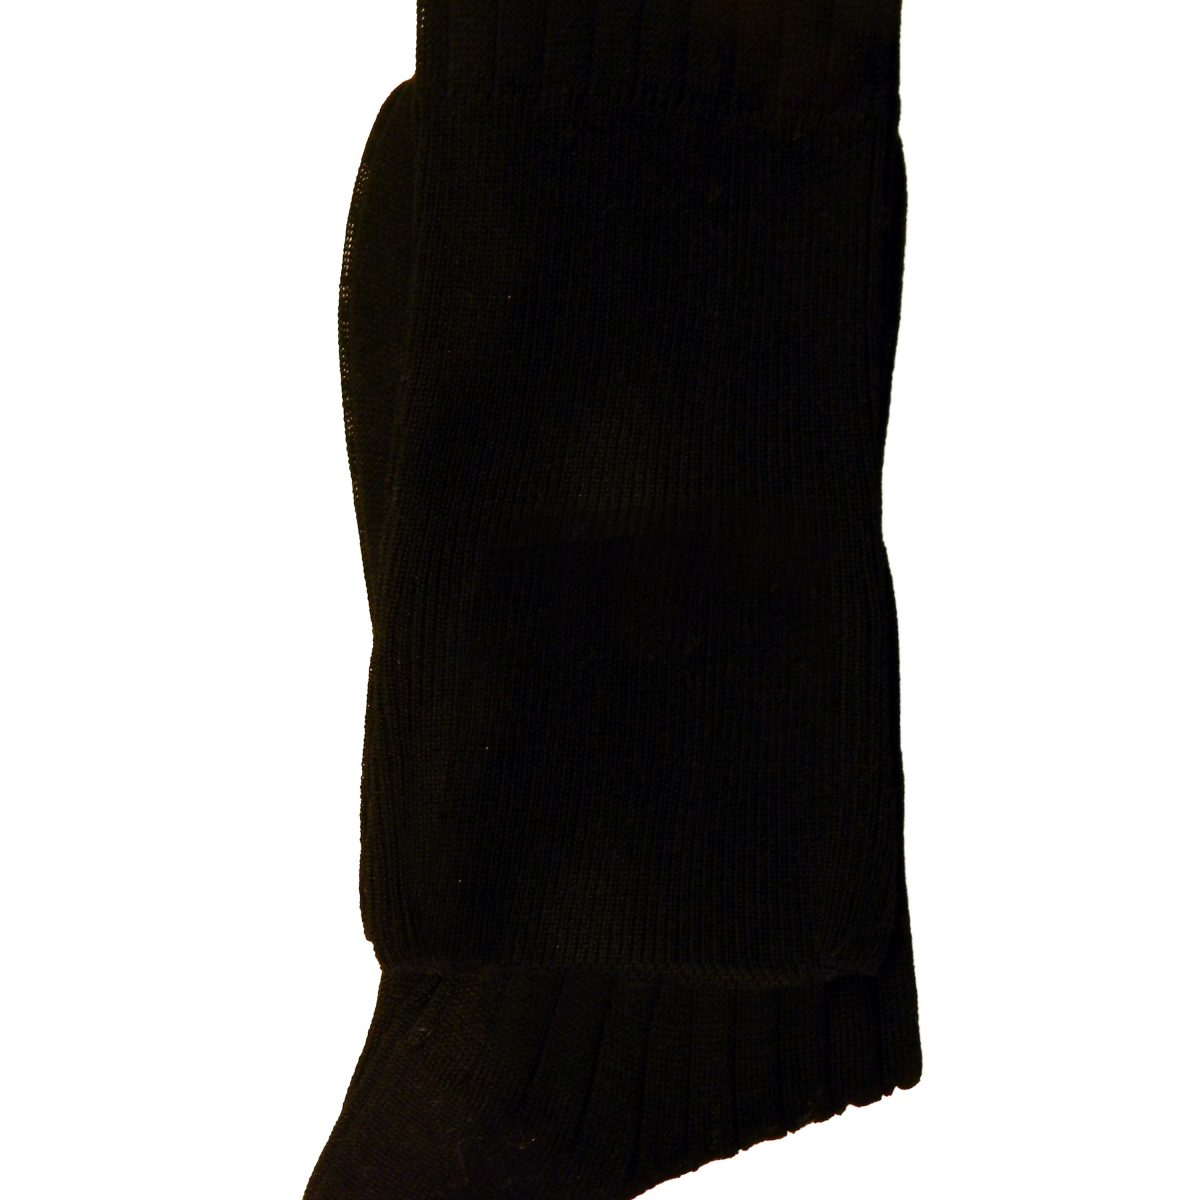 Calza nera